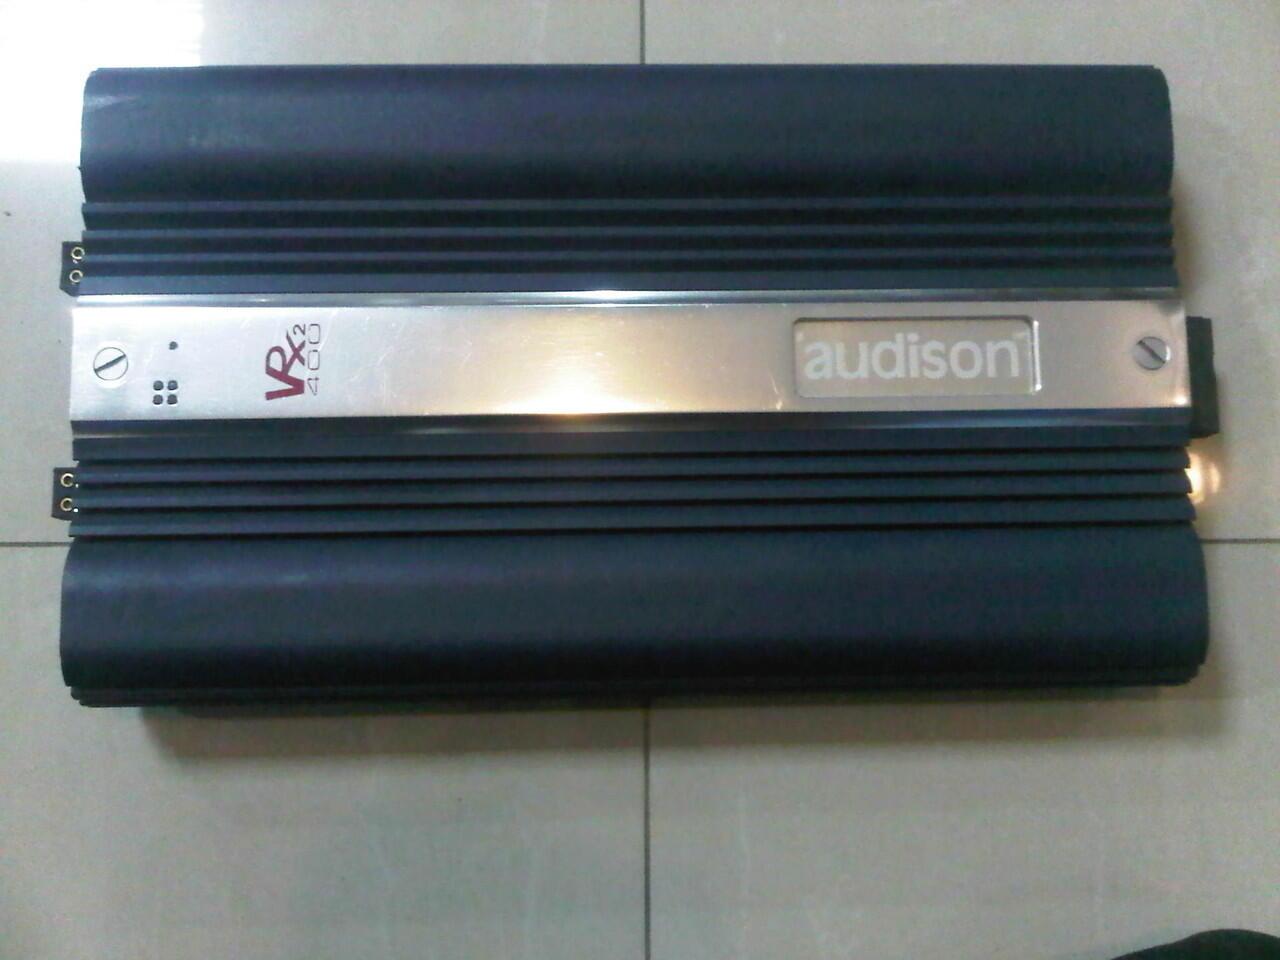 power audison,phoniex gold